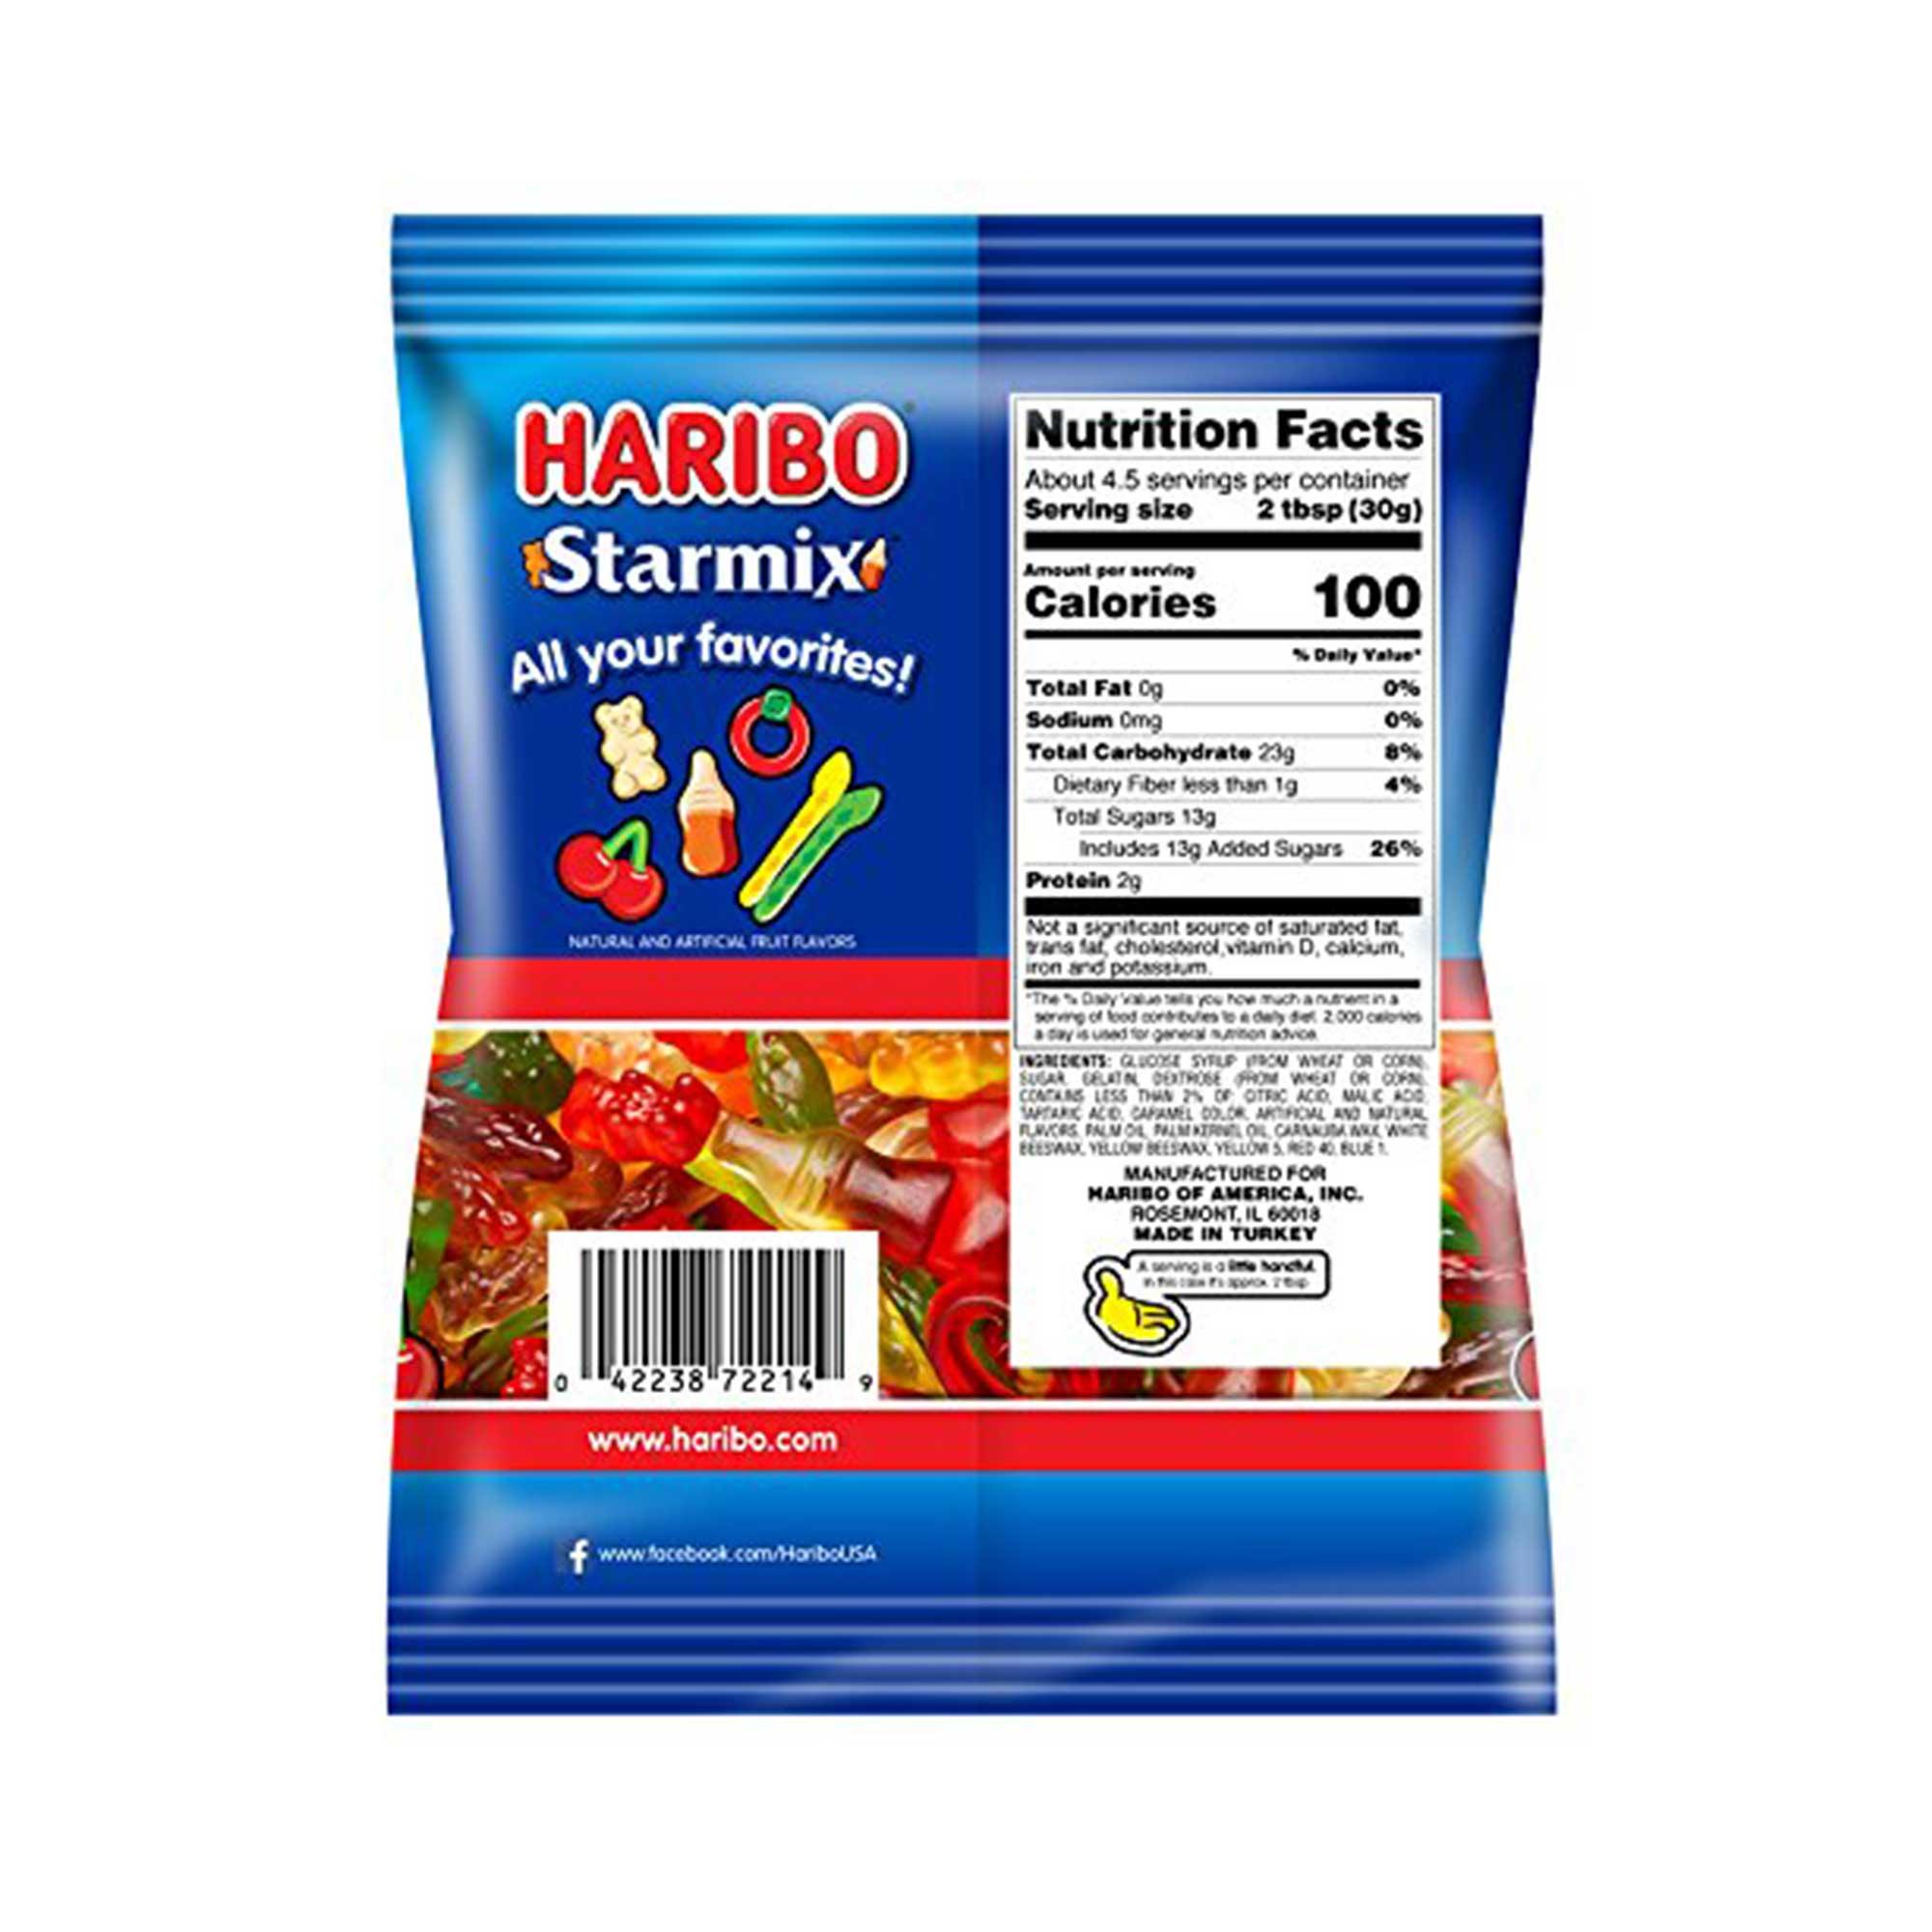 HARIBO Gummy Candy Starmix 5 Oz